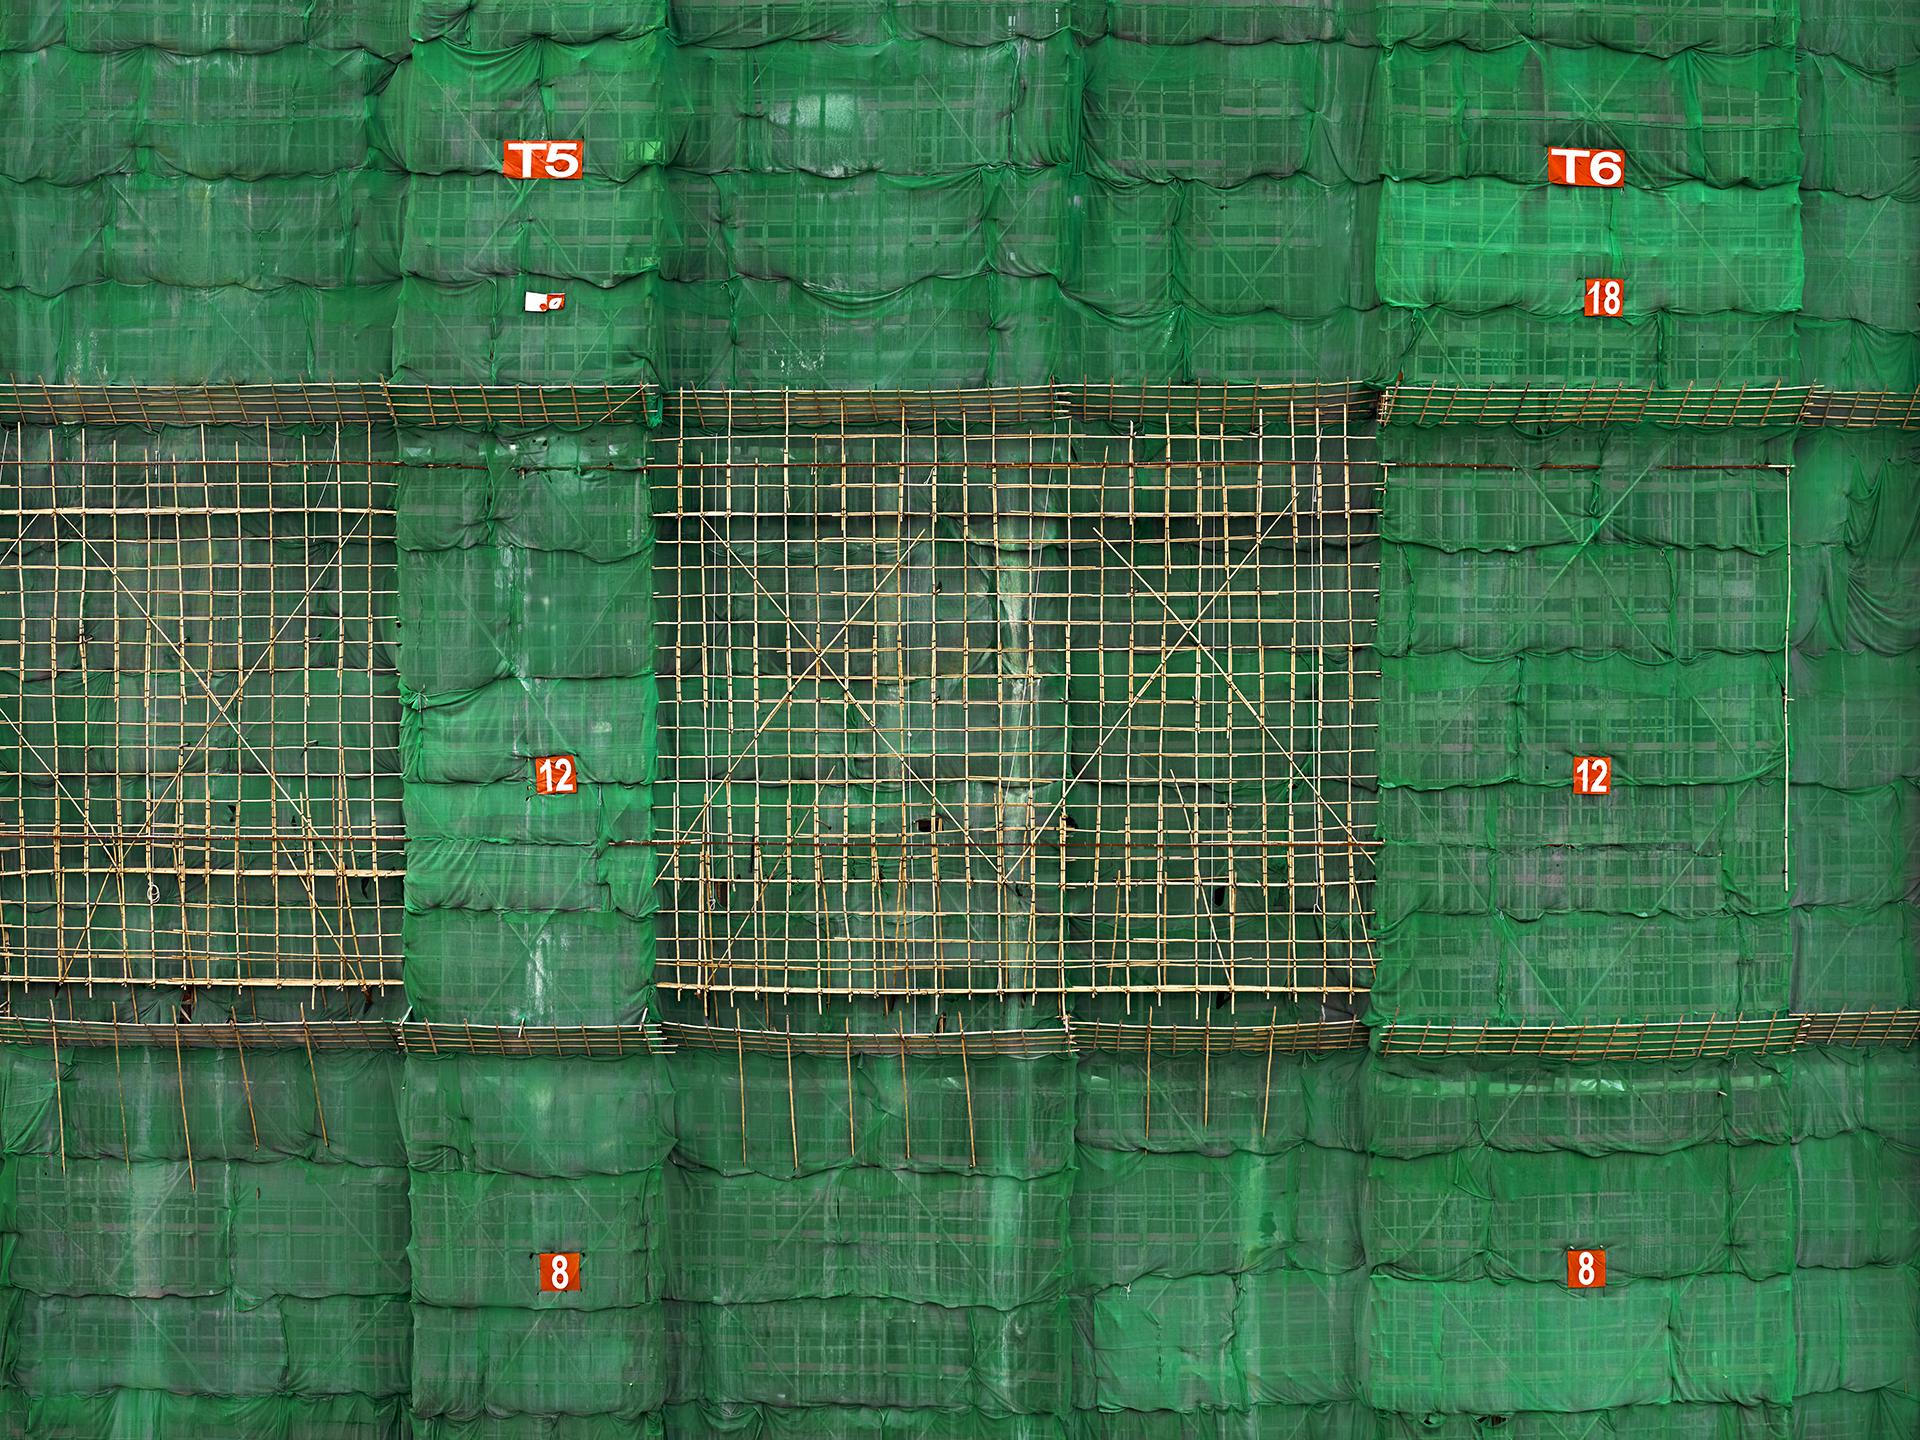 Photographer captures beauty of Hong Kong's bamboo